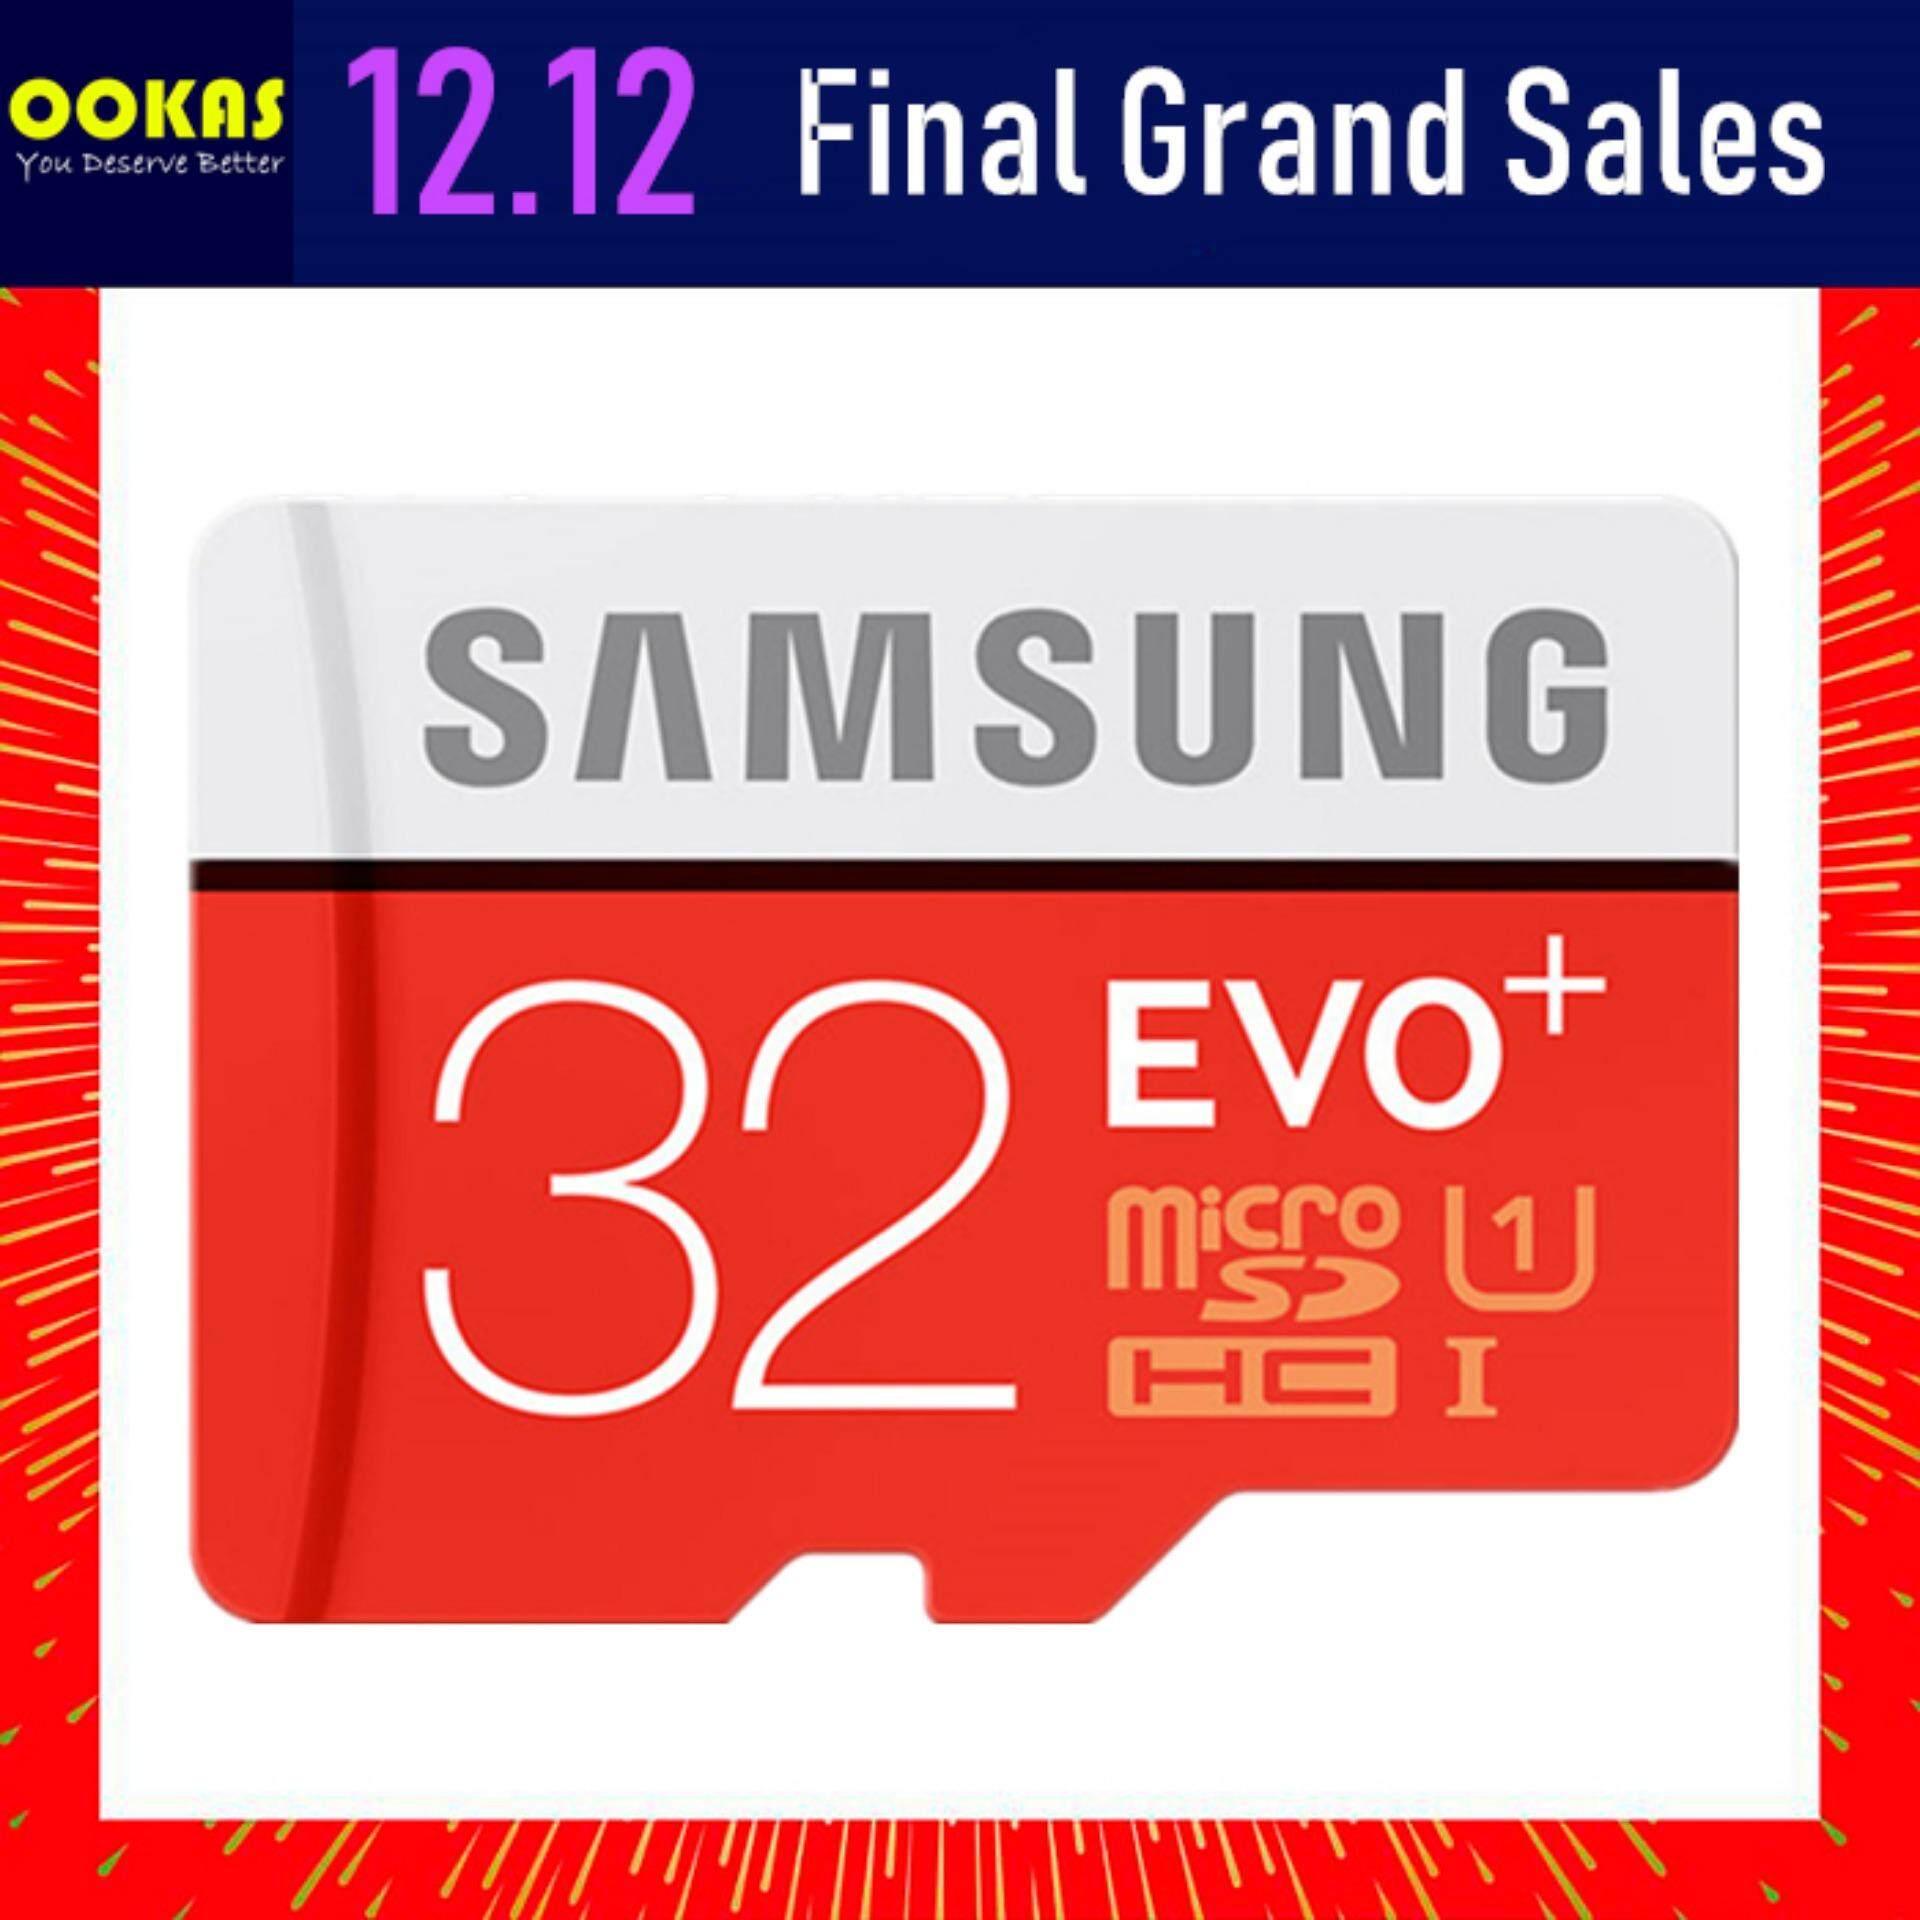 Samsung 95MB/s Class 10 Evo Plus 32GB Card MicroSD